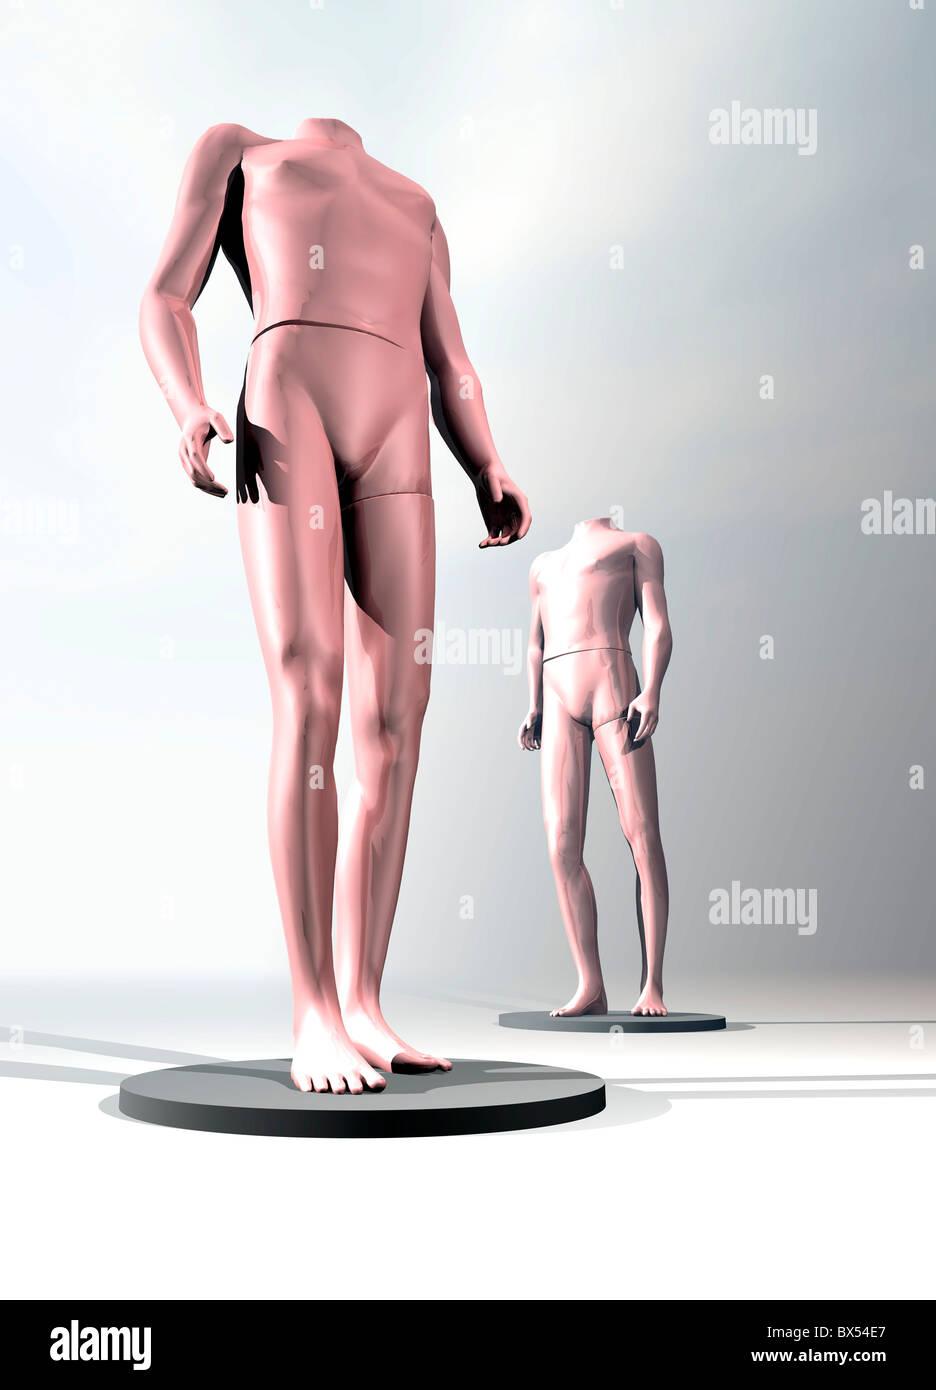 Spare body parts, conceptual artwork - Stock Image